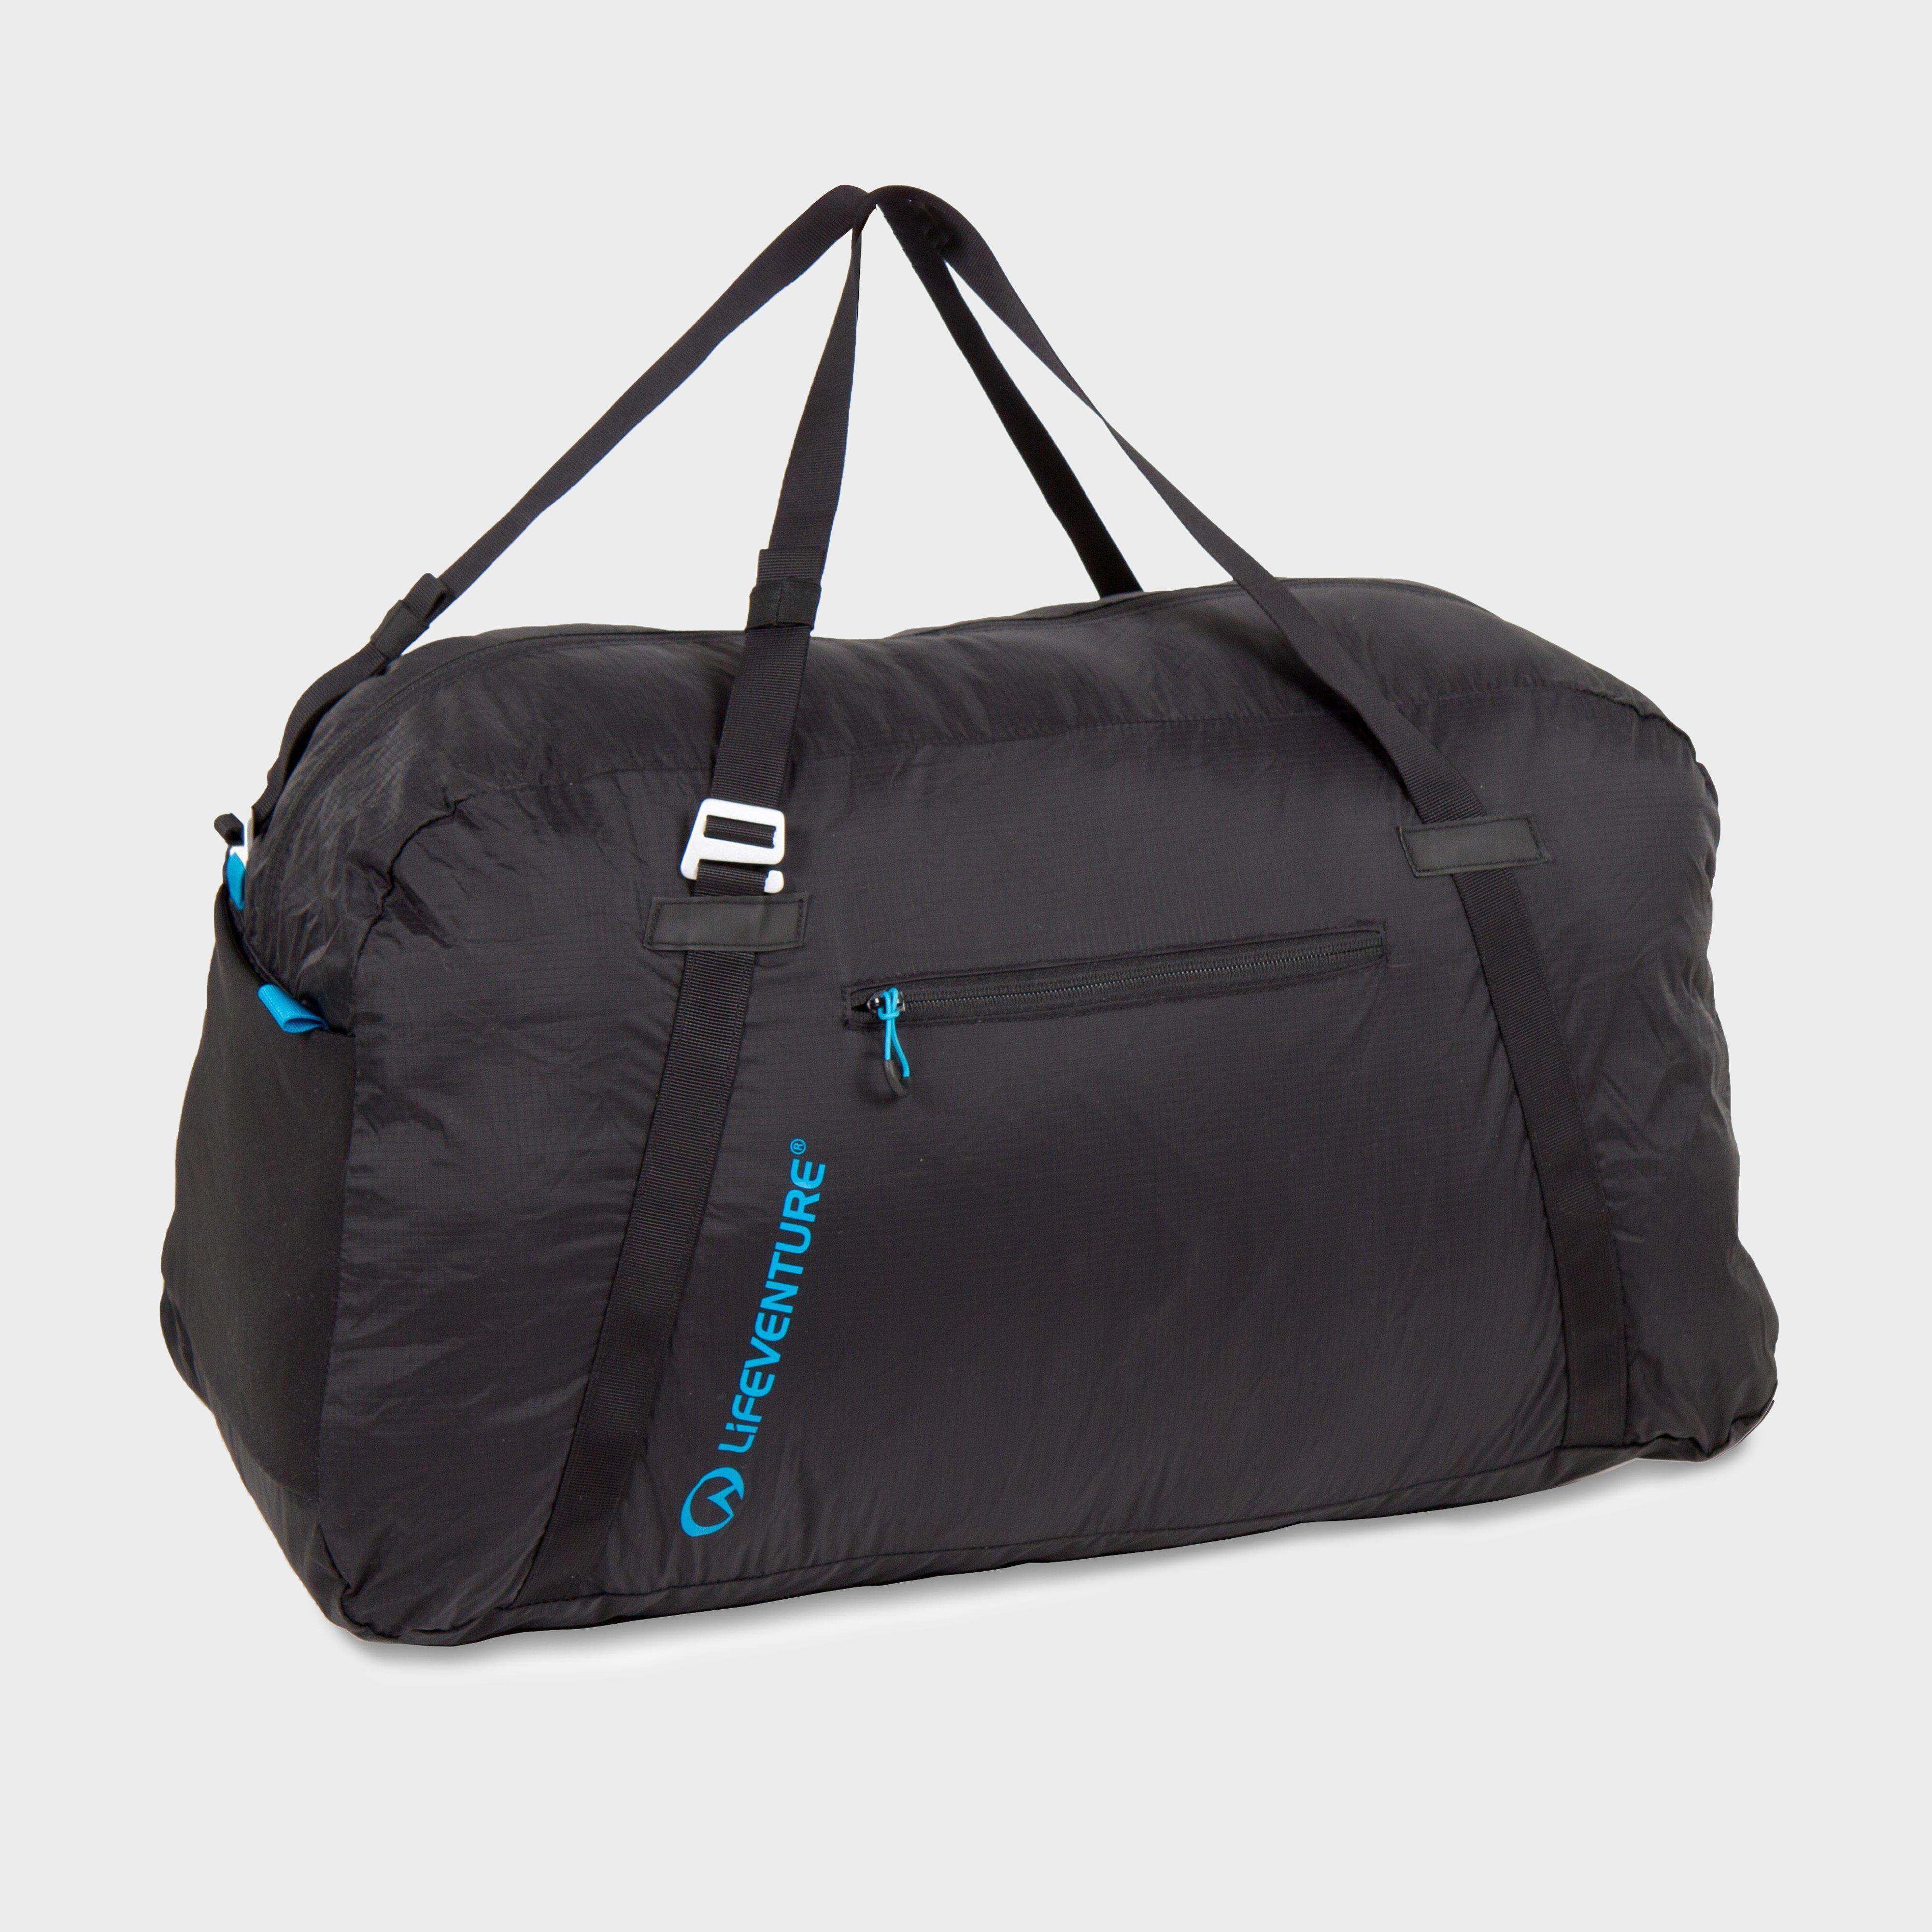 Lifeventure Lifeventure Packable Duffle Bag 70L - Black, Black